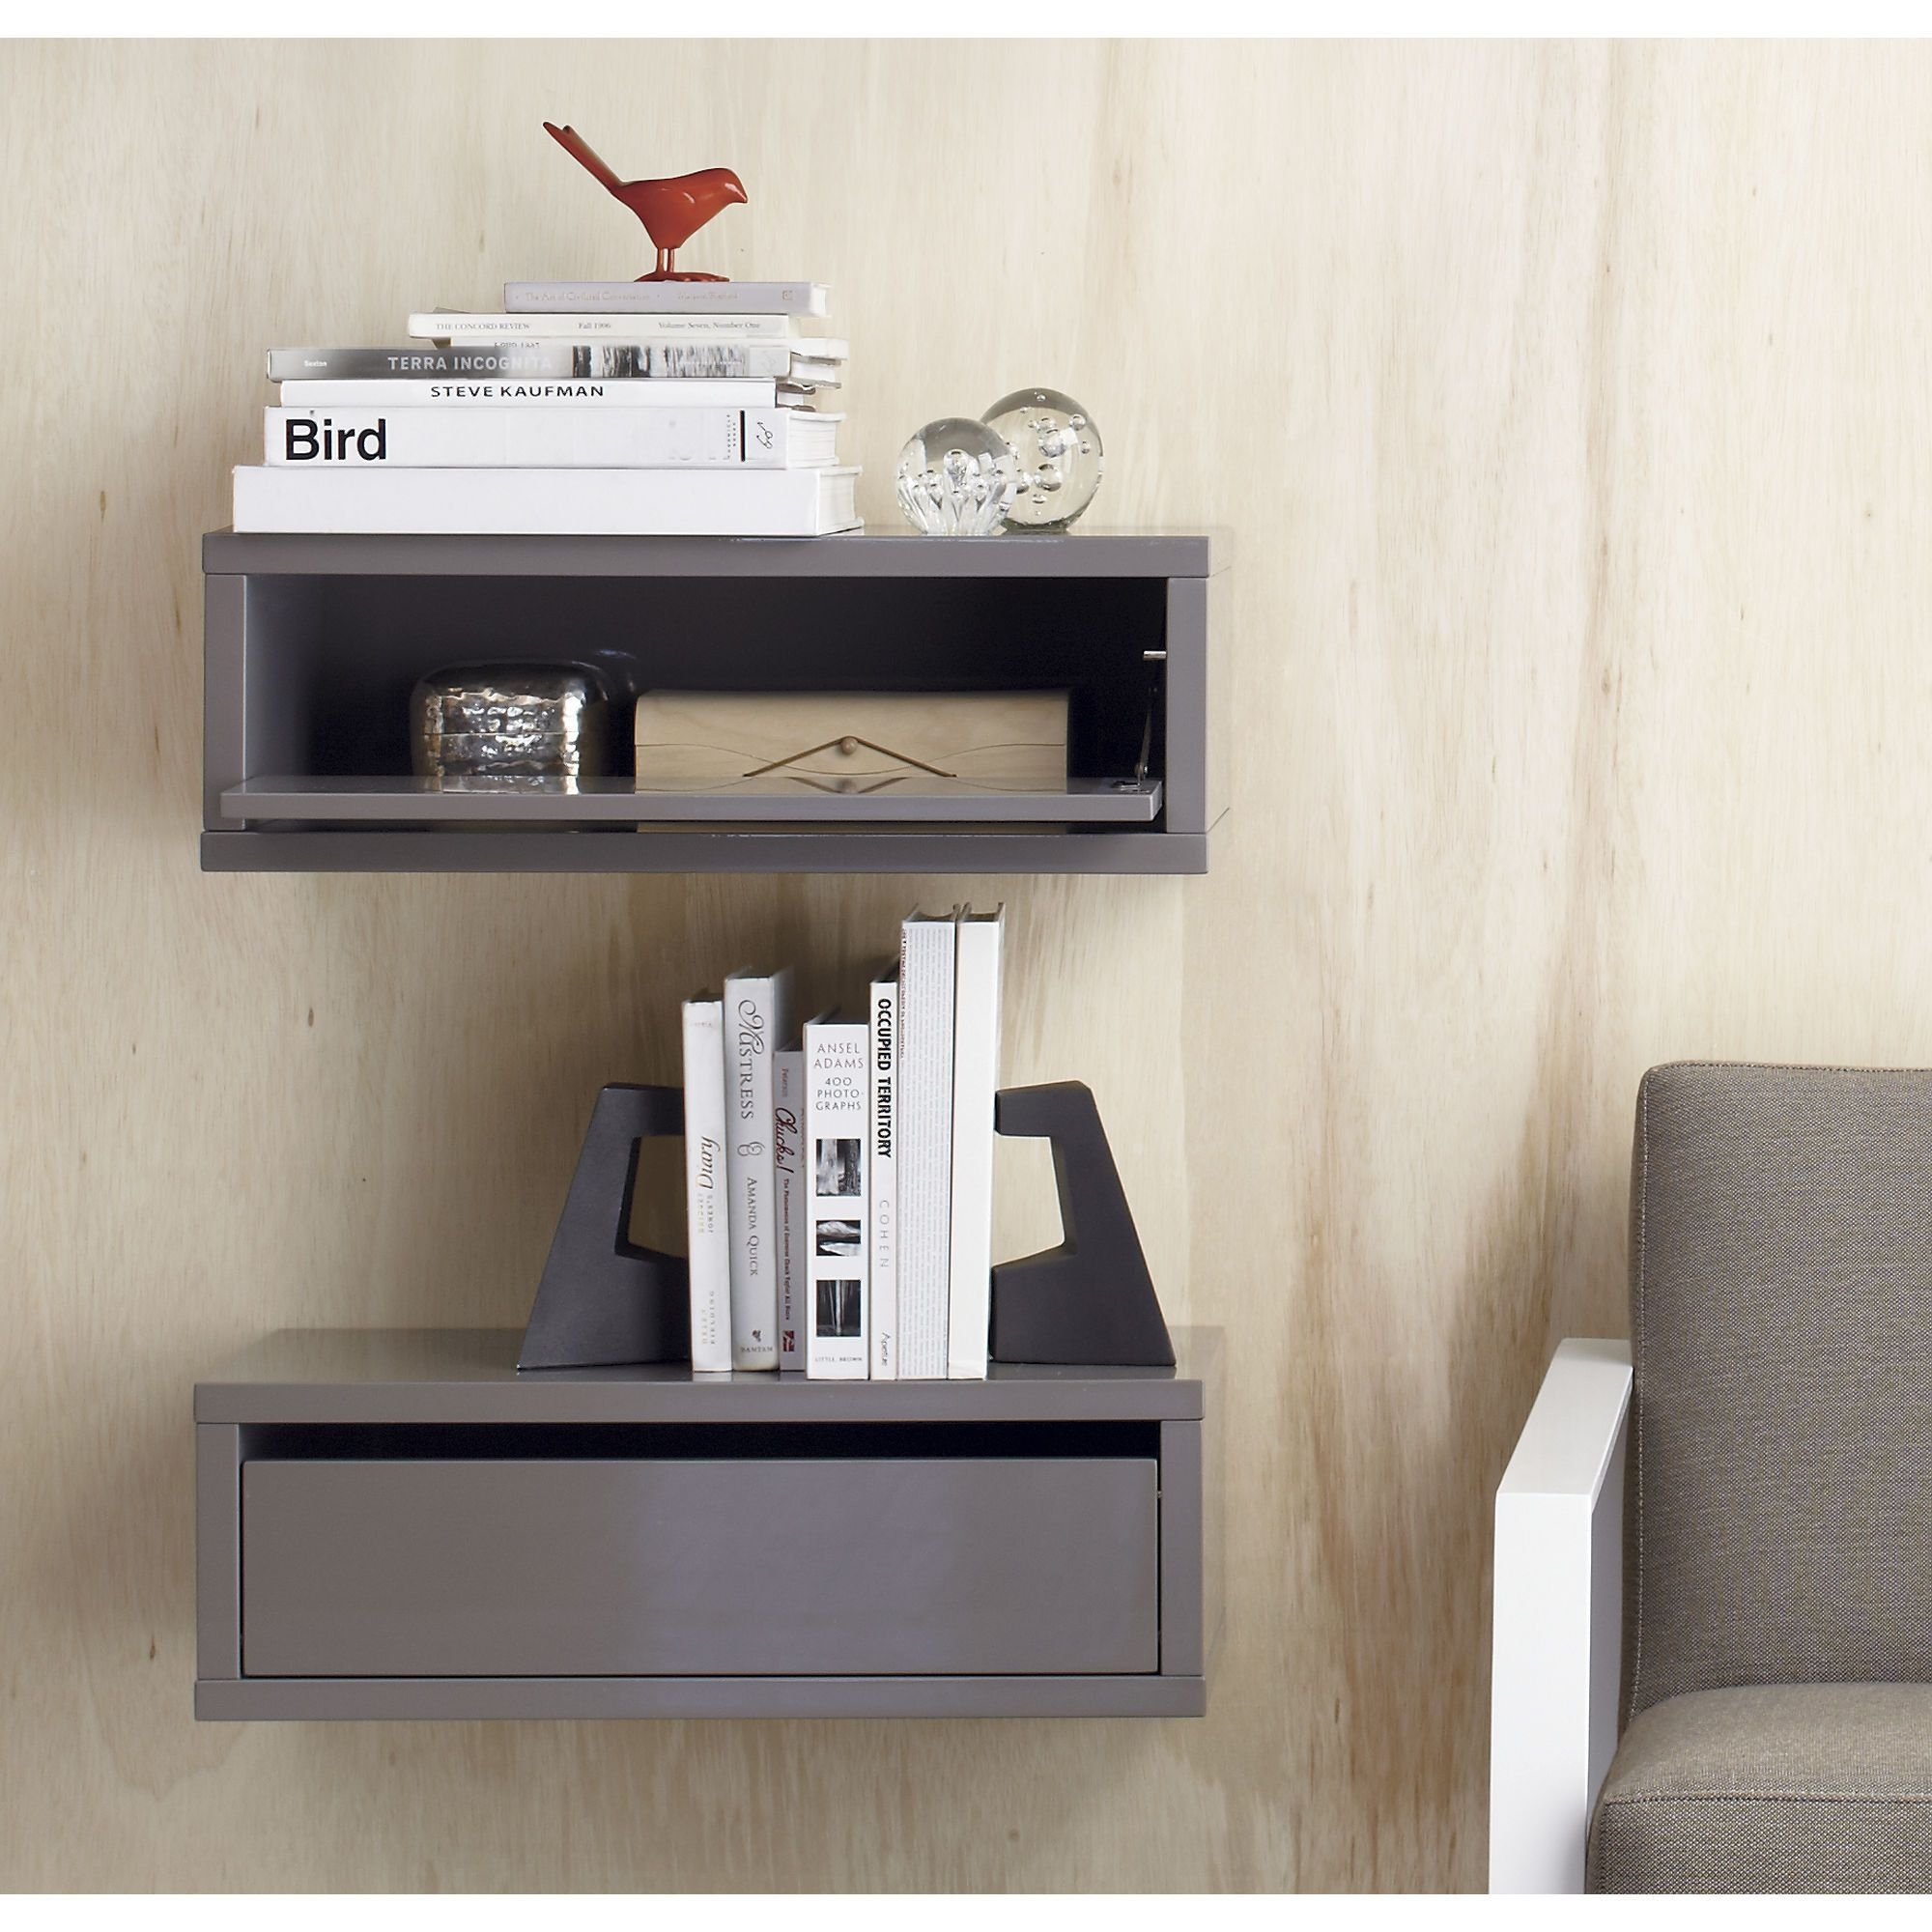 wall mounted media storage foter rh foter com wall mount media shelf ideas wall mount media shelf canada